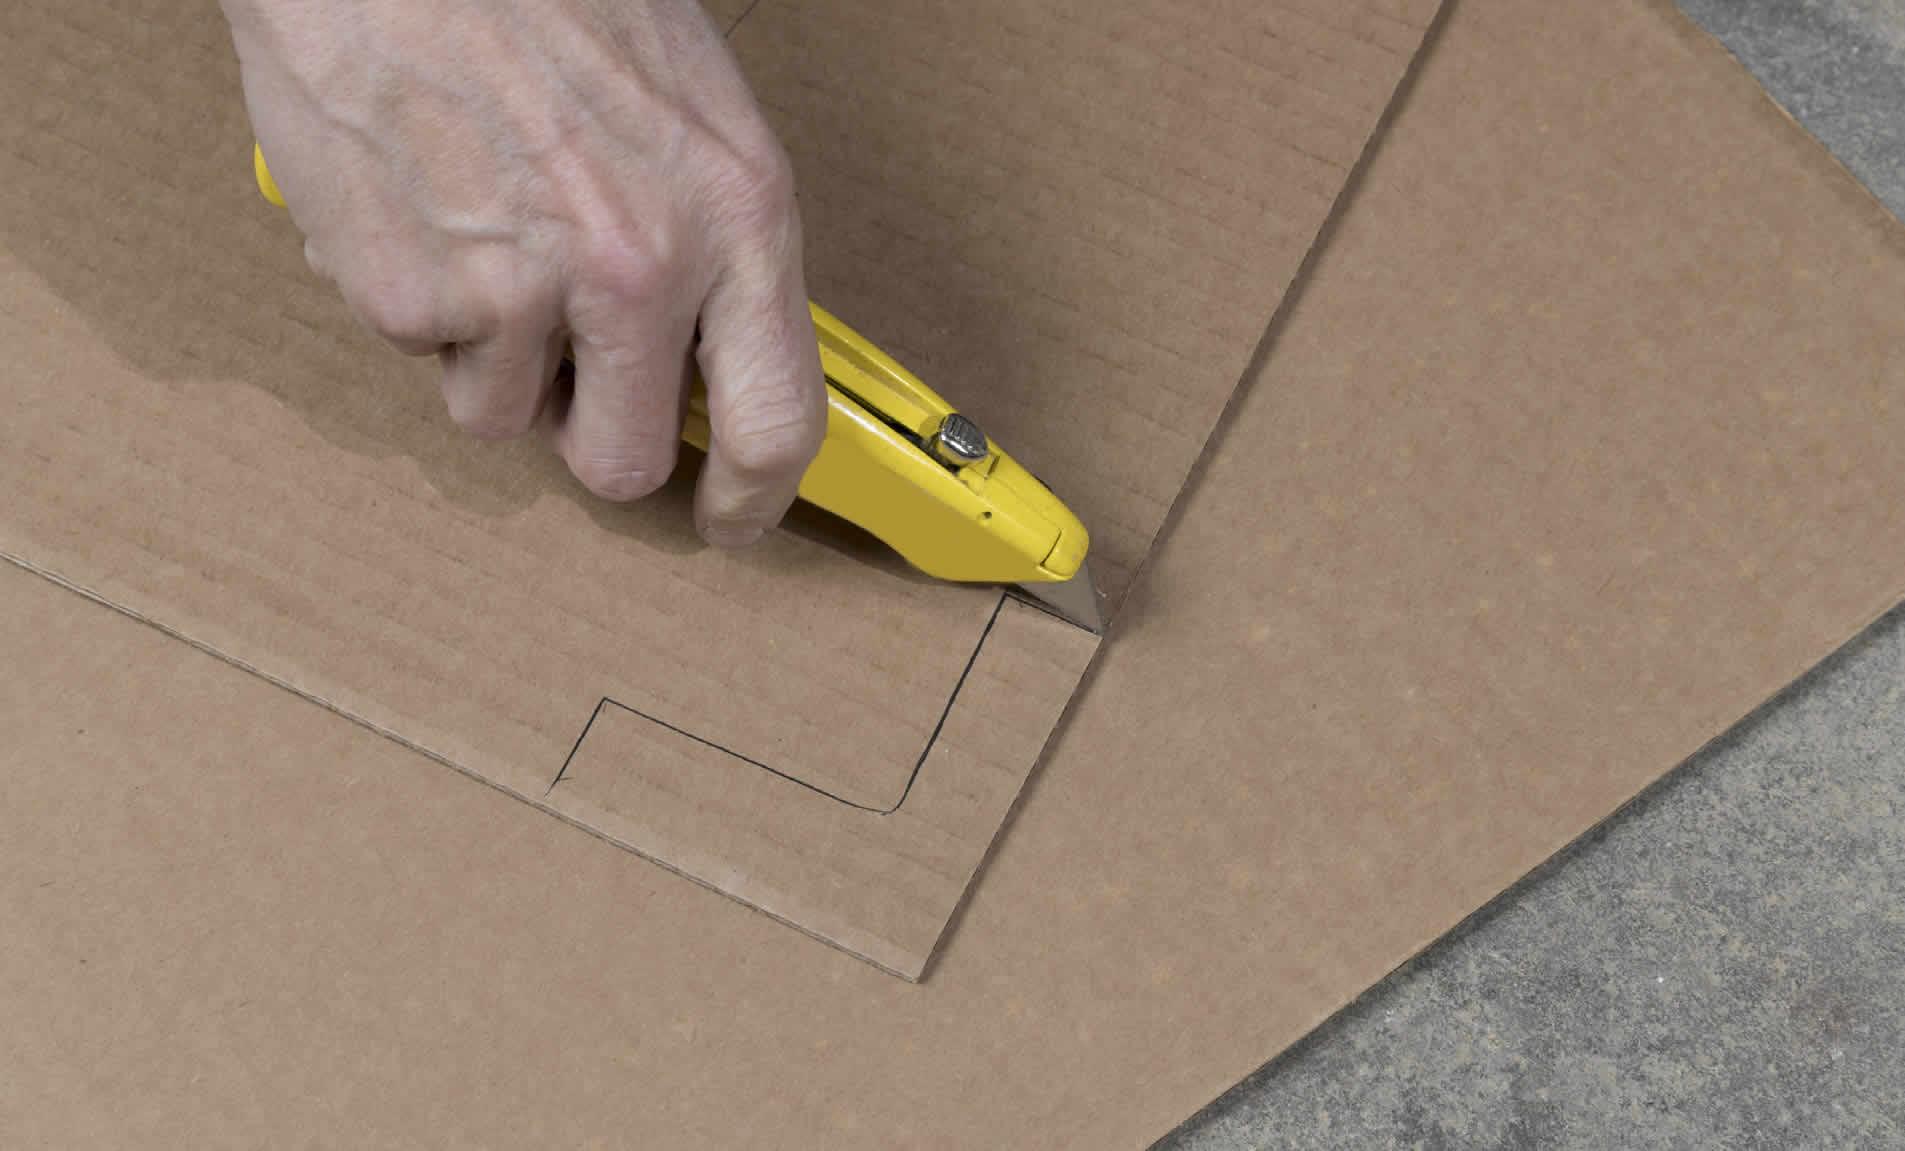 cutting cardboard with a box cutter